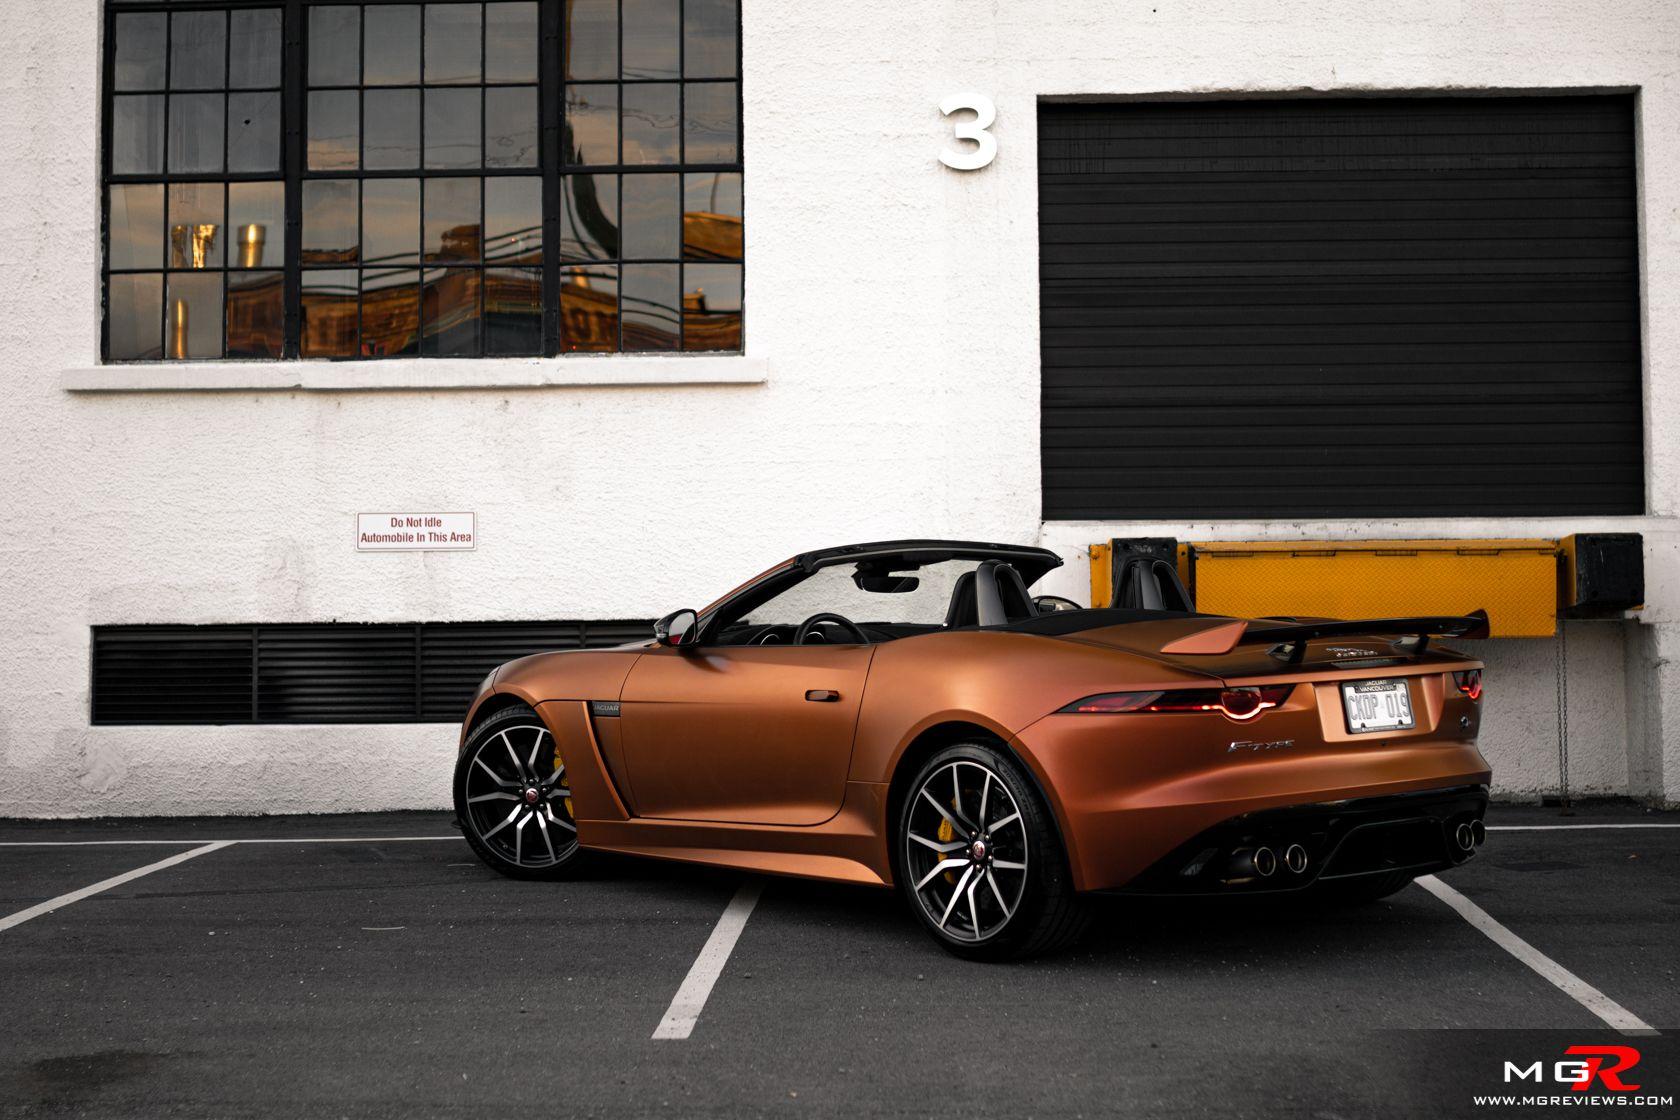 2019 Jaguar F Type Svr Mgreviews Com Jaguar F Type Jaguar Automotive Photography